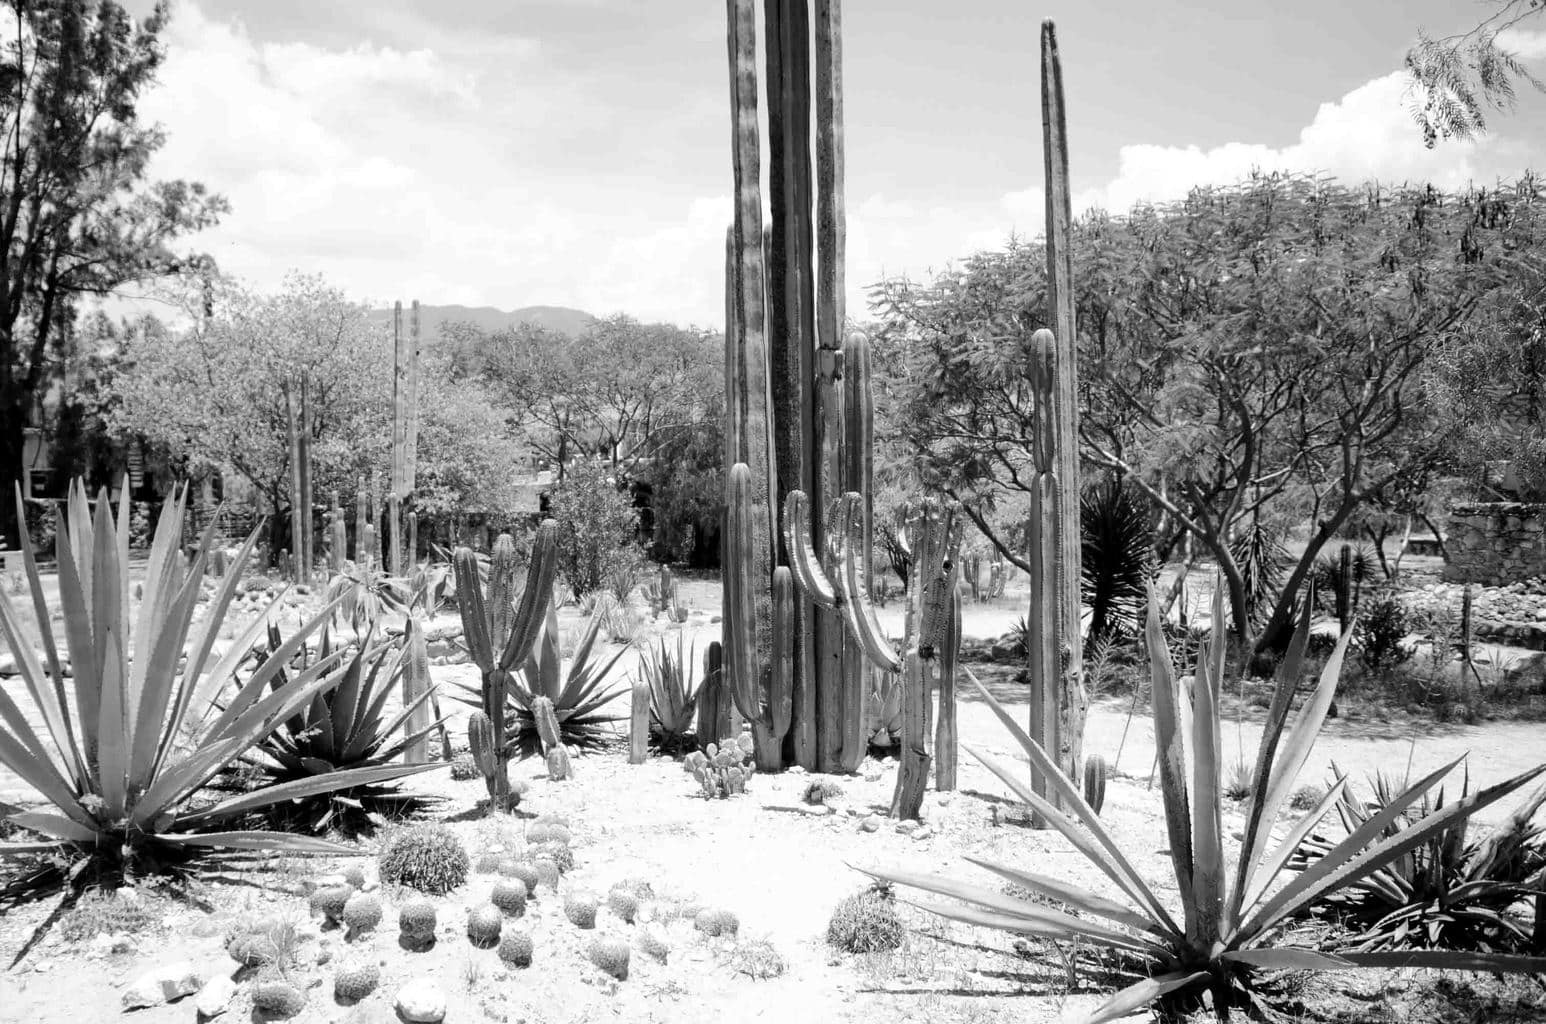 Cactus landscape in Oaxaca, Mexico